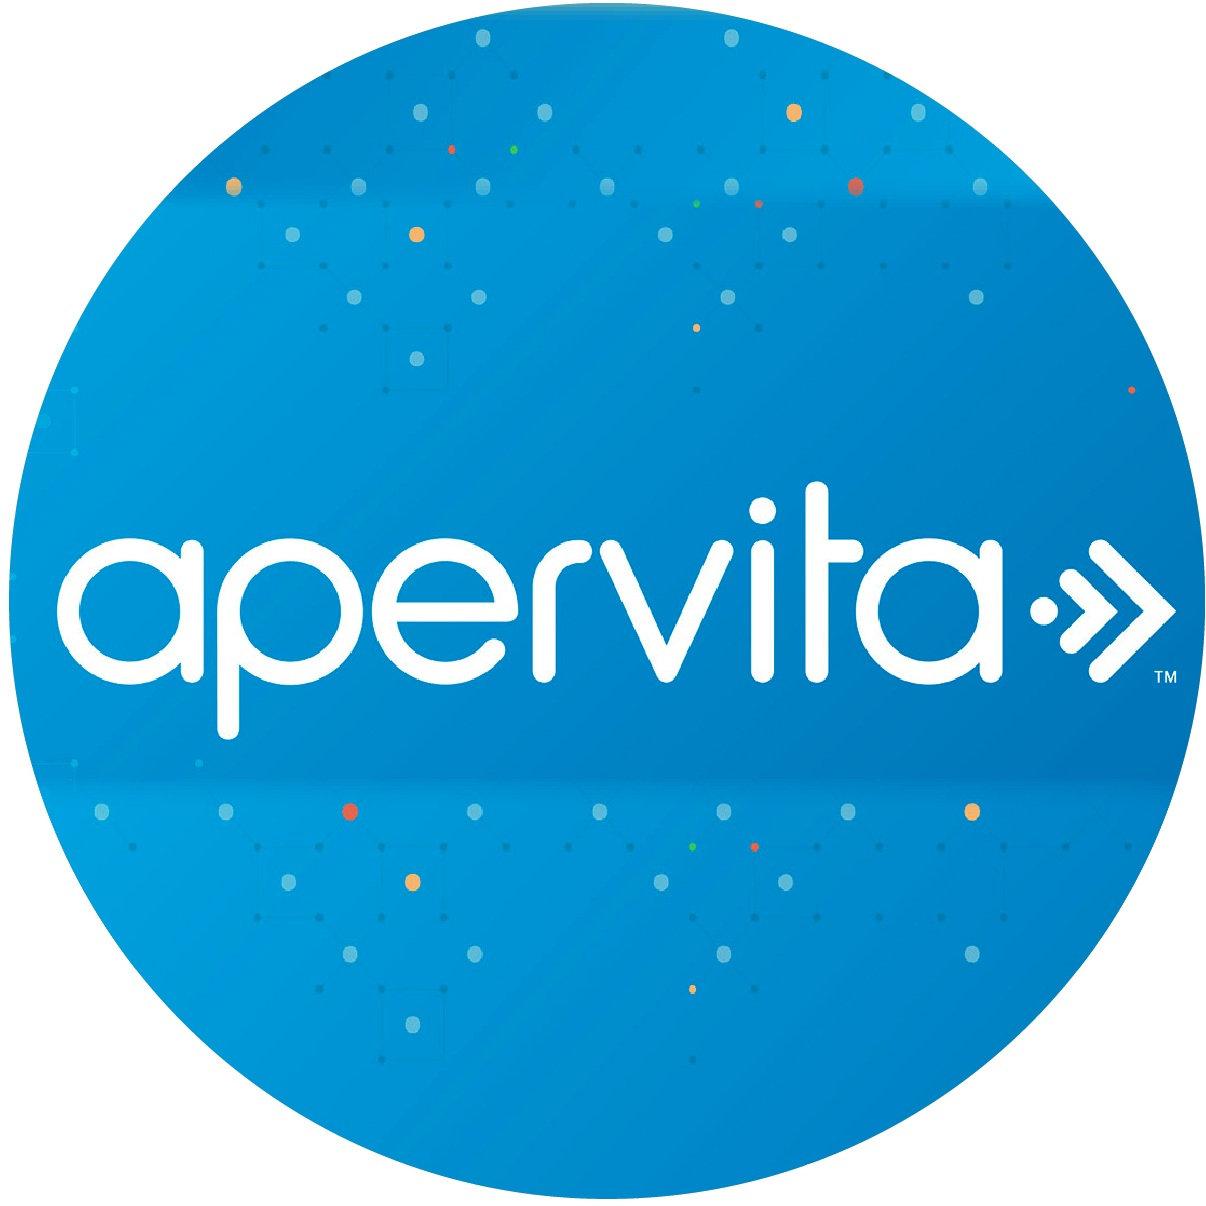 Apervita.jpg